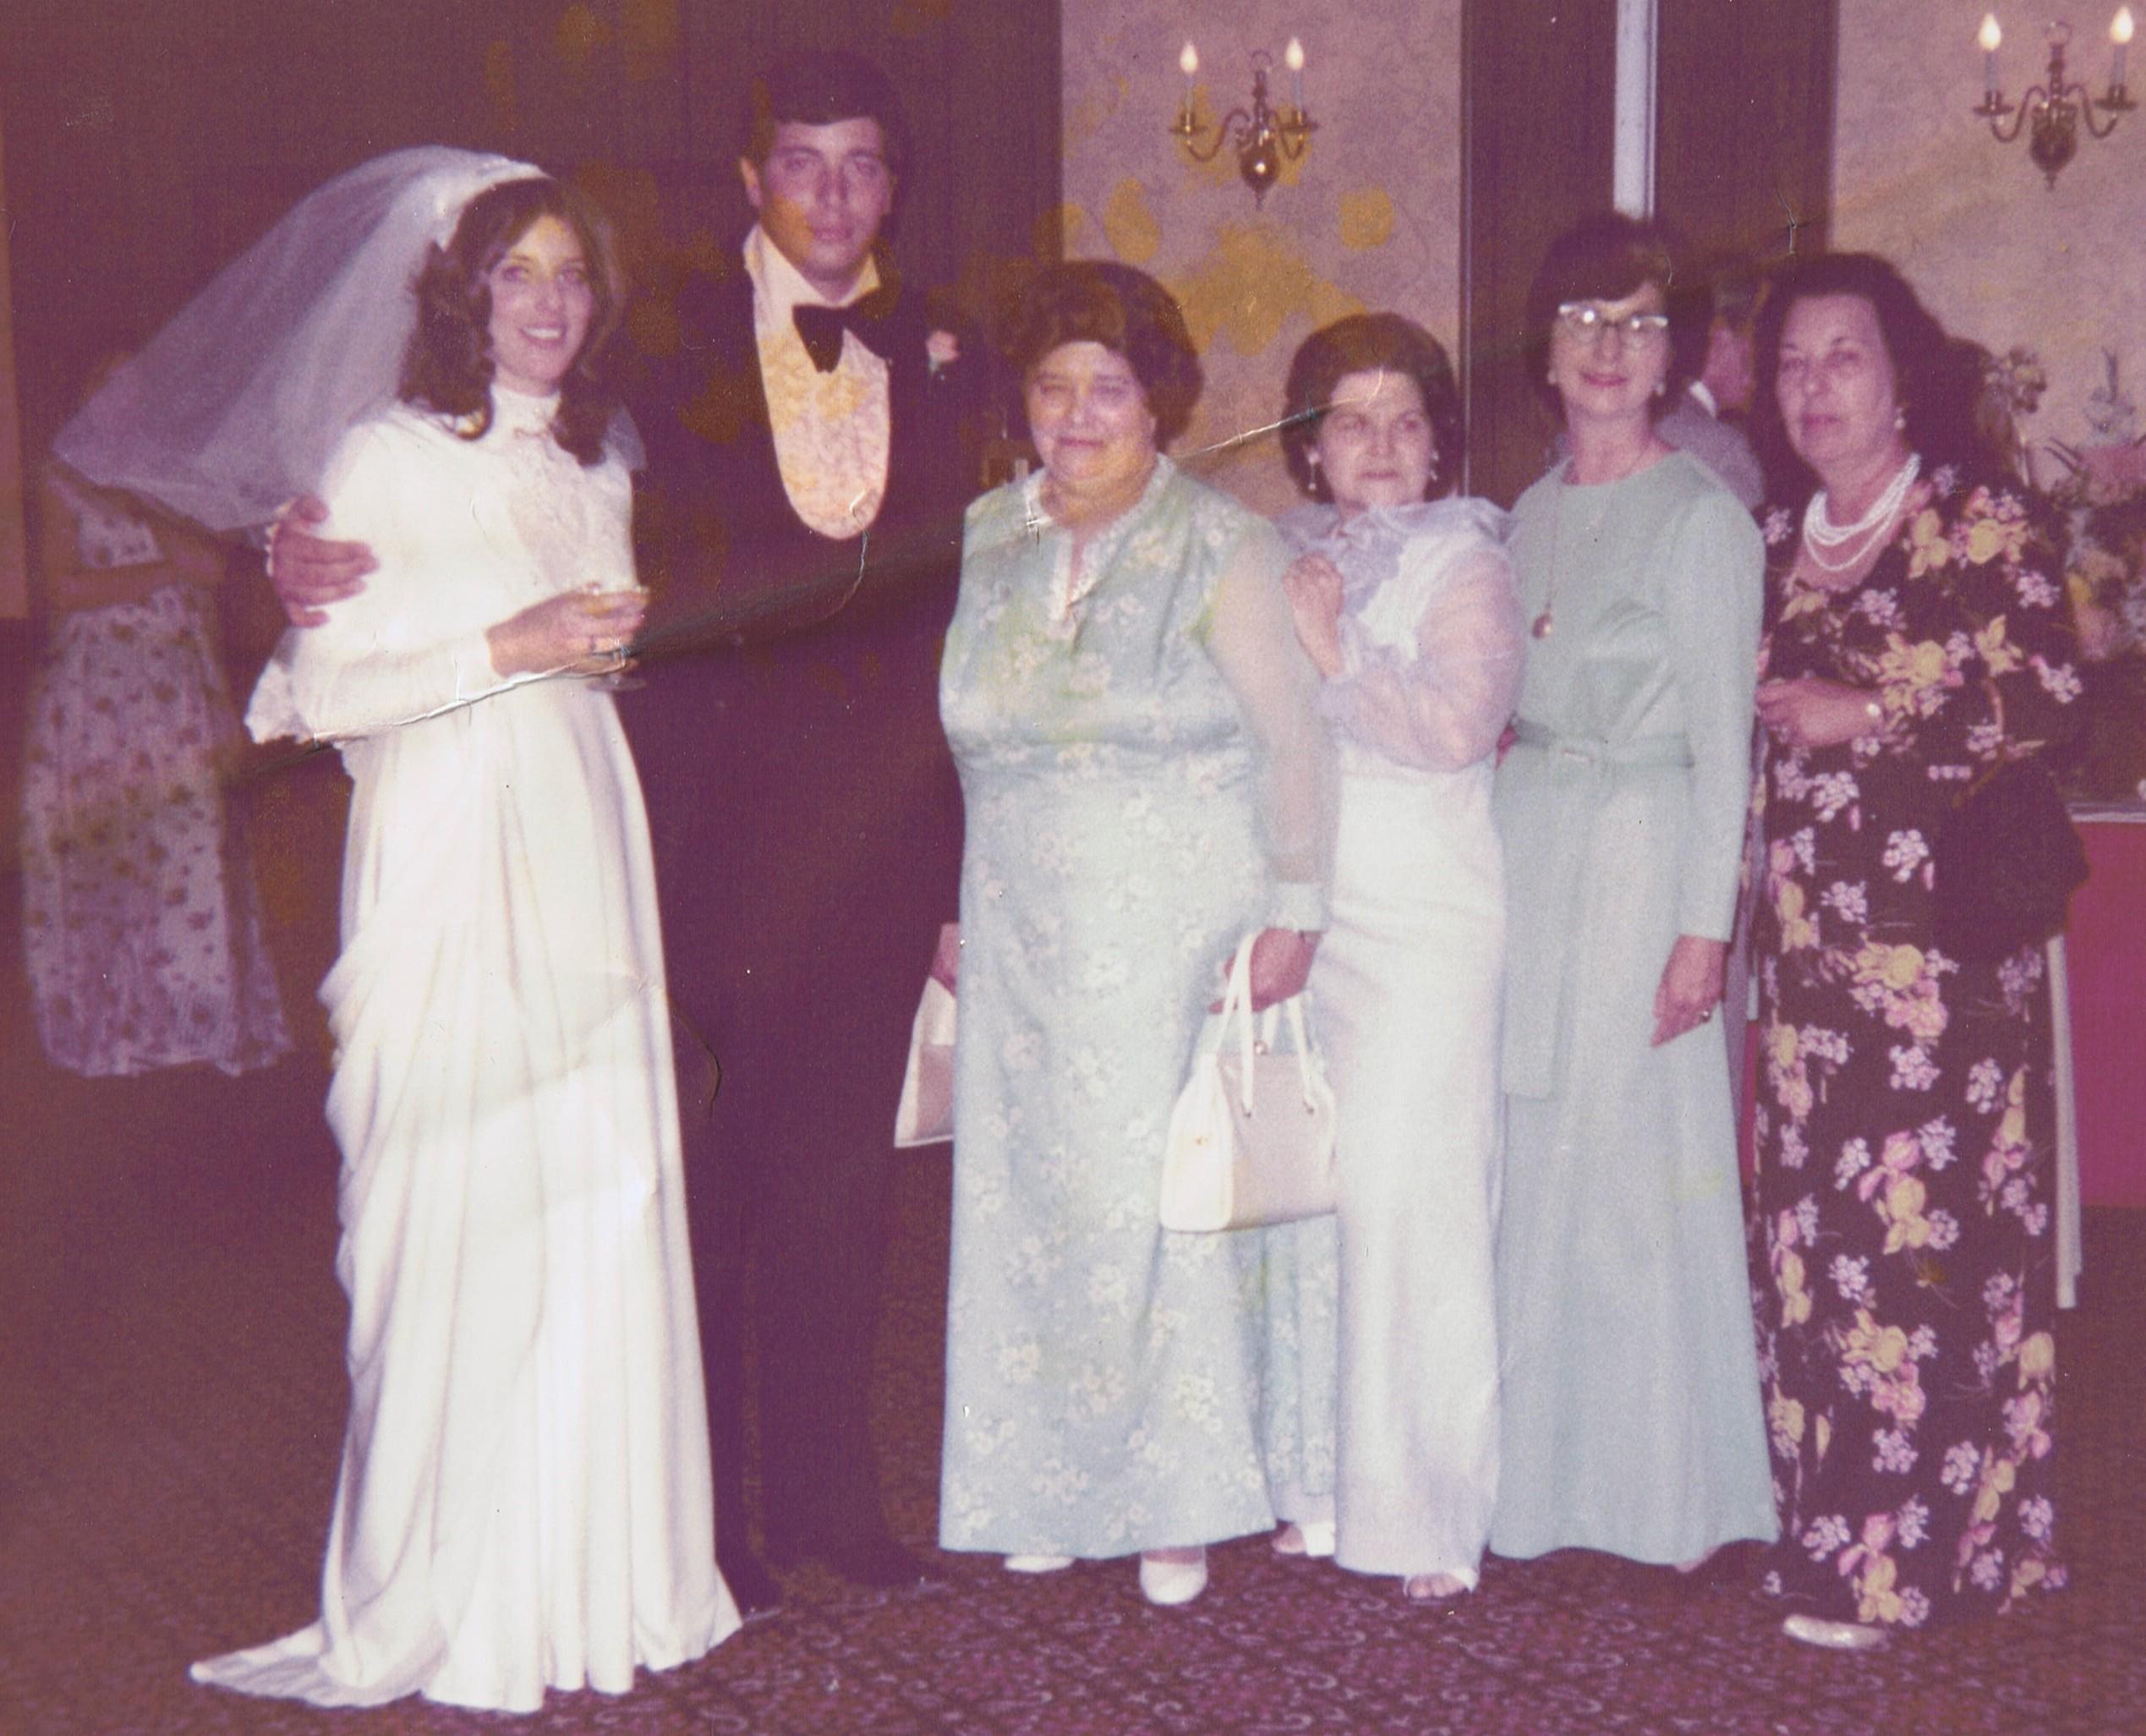 andrea ann linton hollis wedding april 24 1976, andrea, john, florence, evelyn, bernie, madge TOKUGAWA IREZUMI SHI SEME JIGOKU AKA INFERNO OF TORTURE (MOVIE 1969)